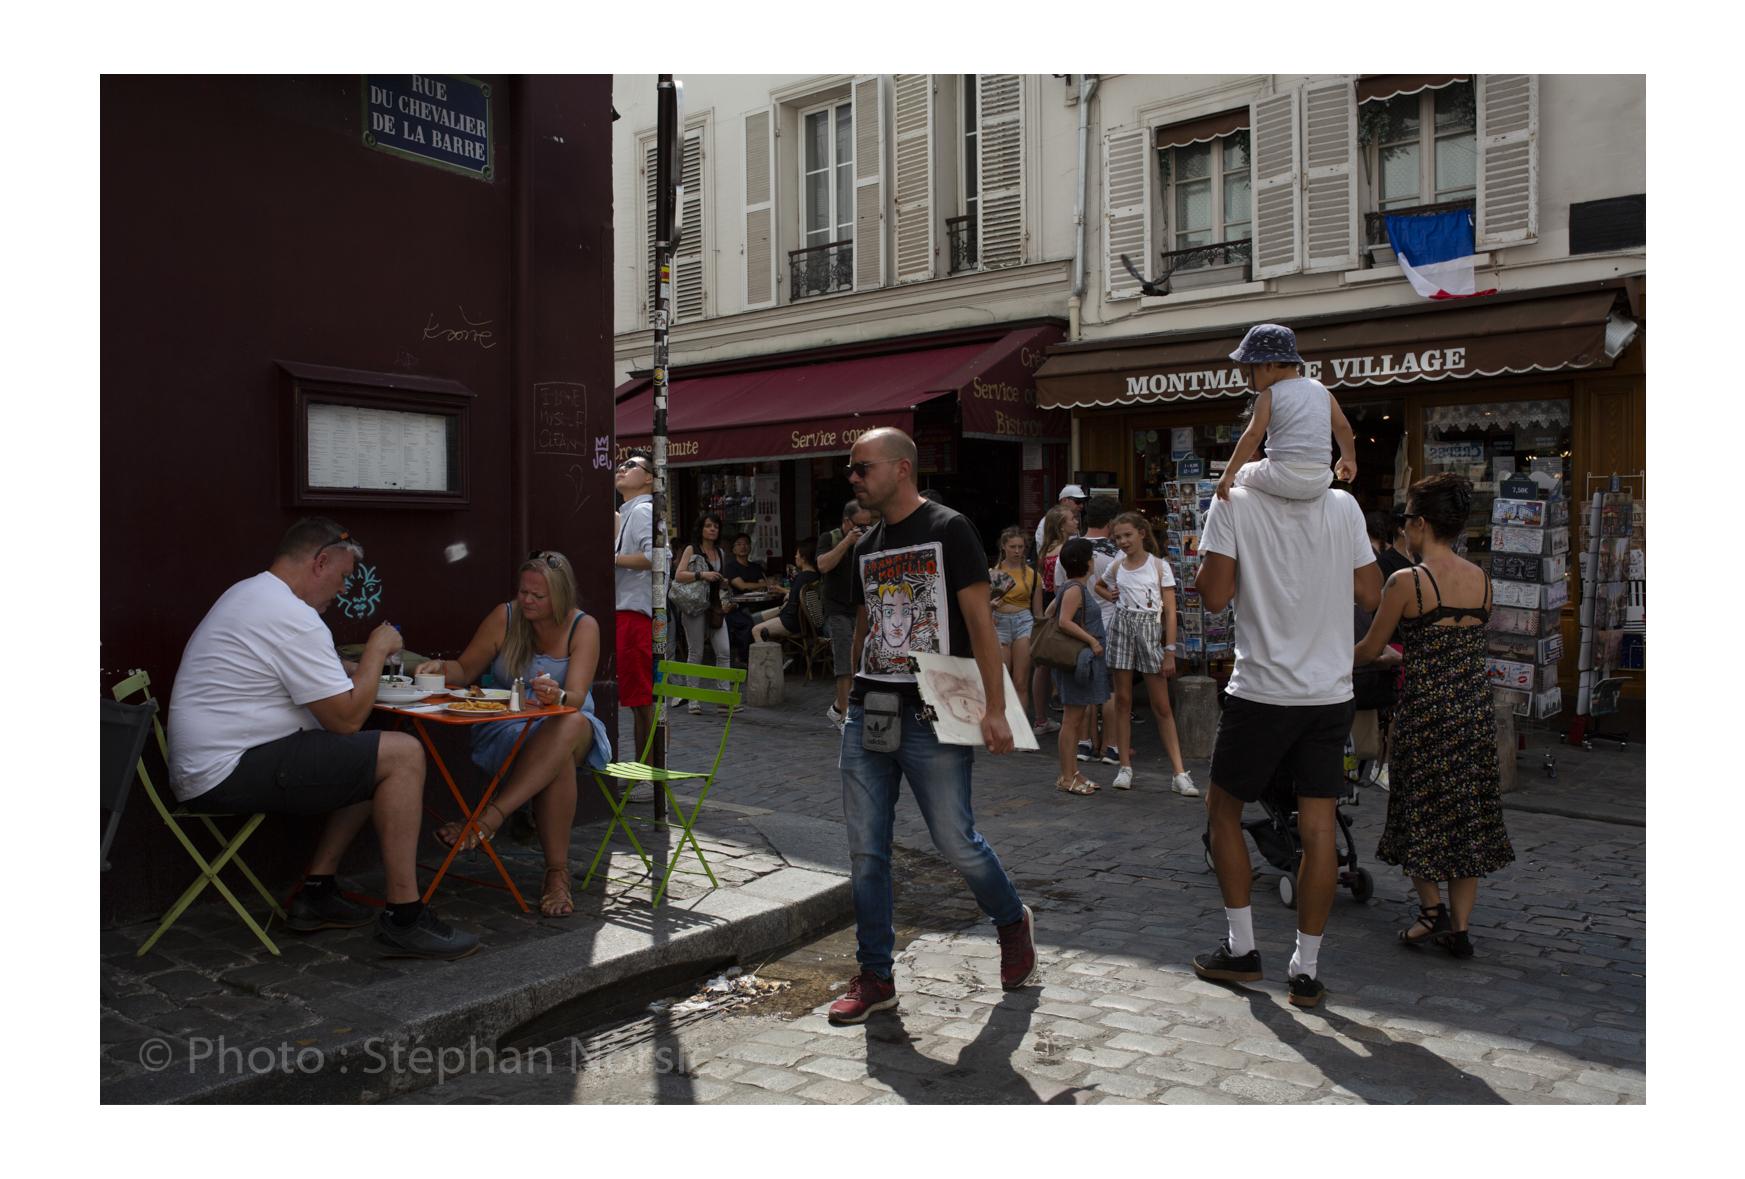 Stephan-Norsic-Paris-ok-500-28